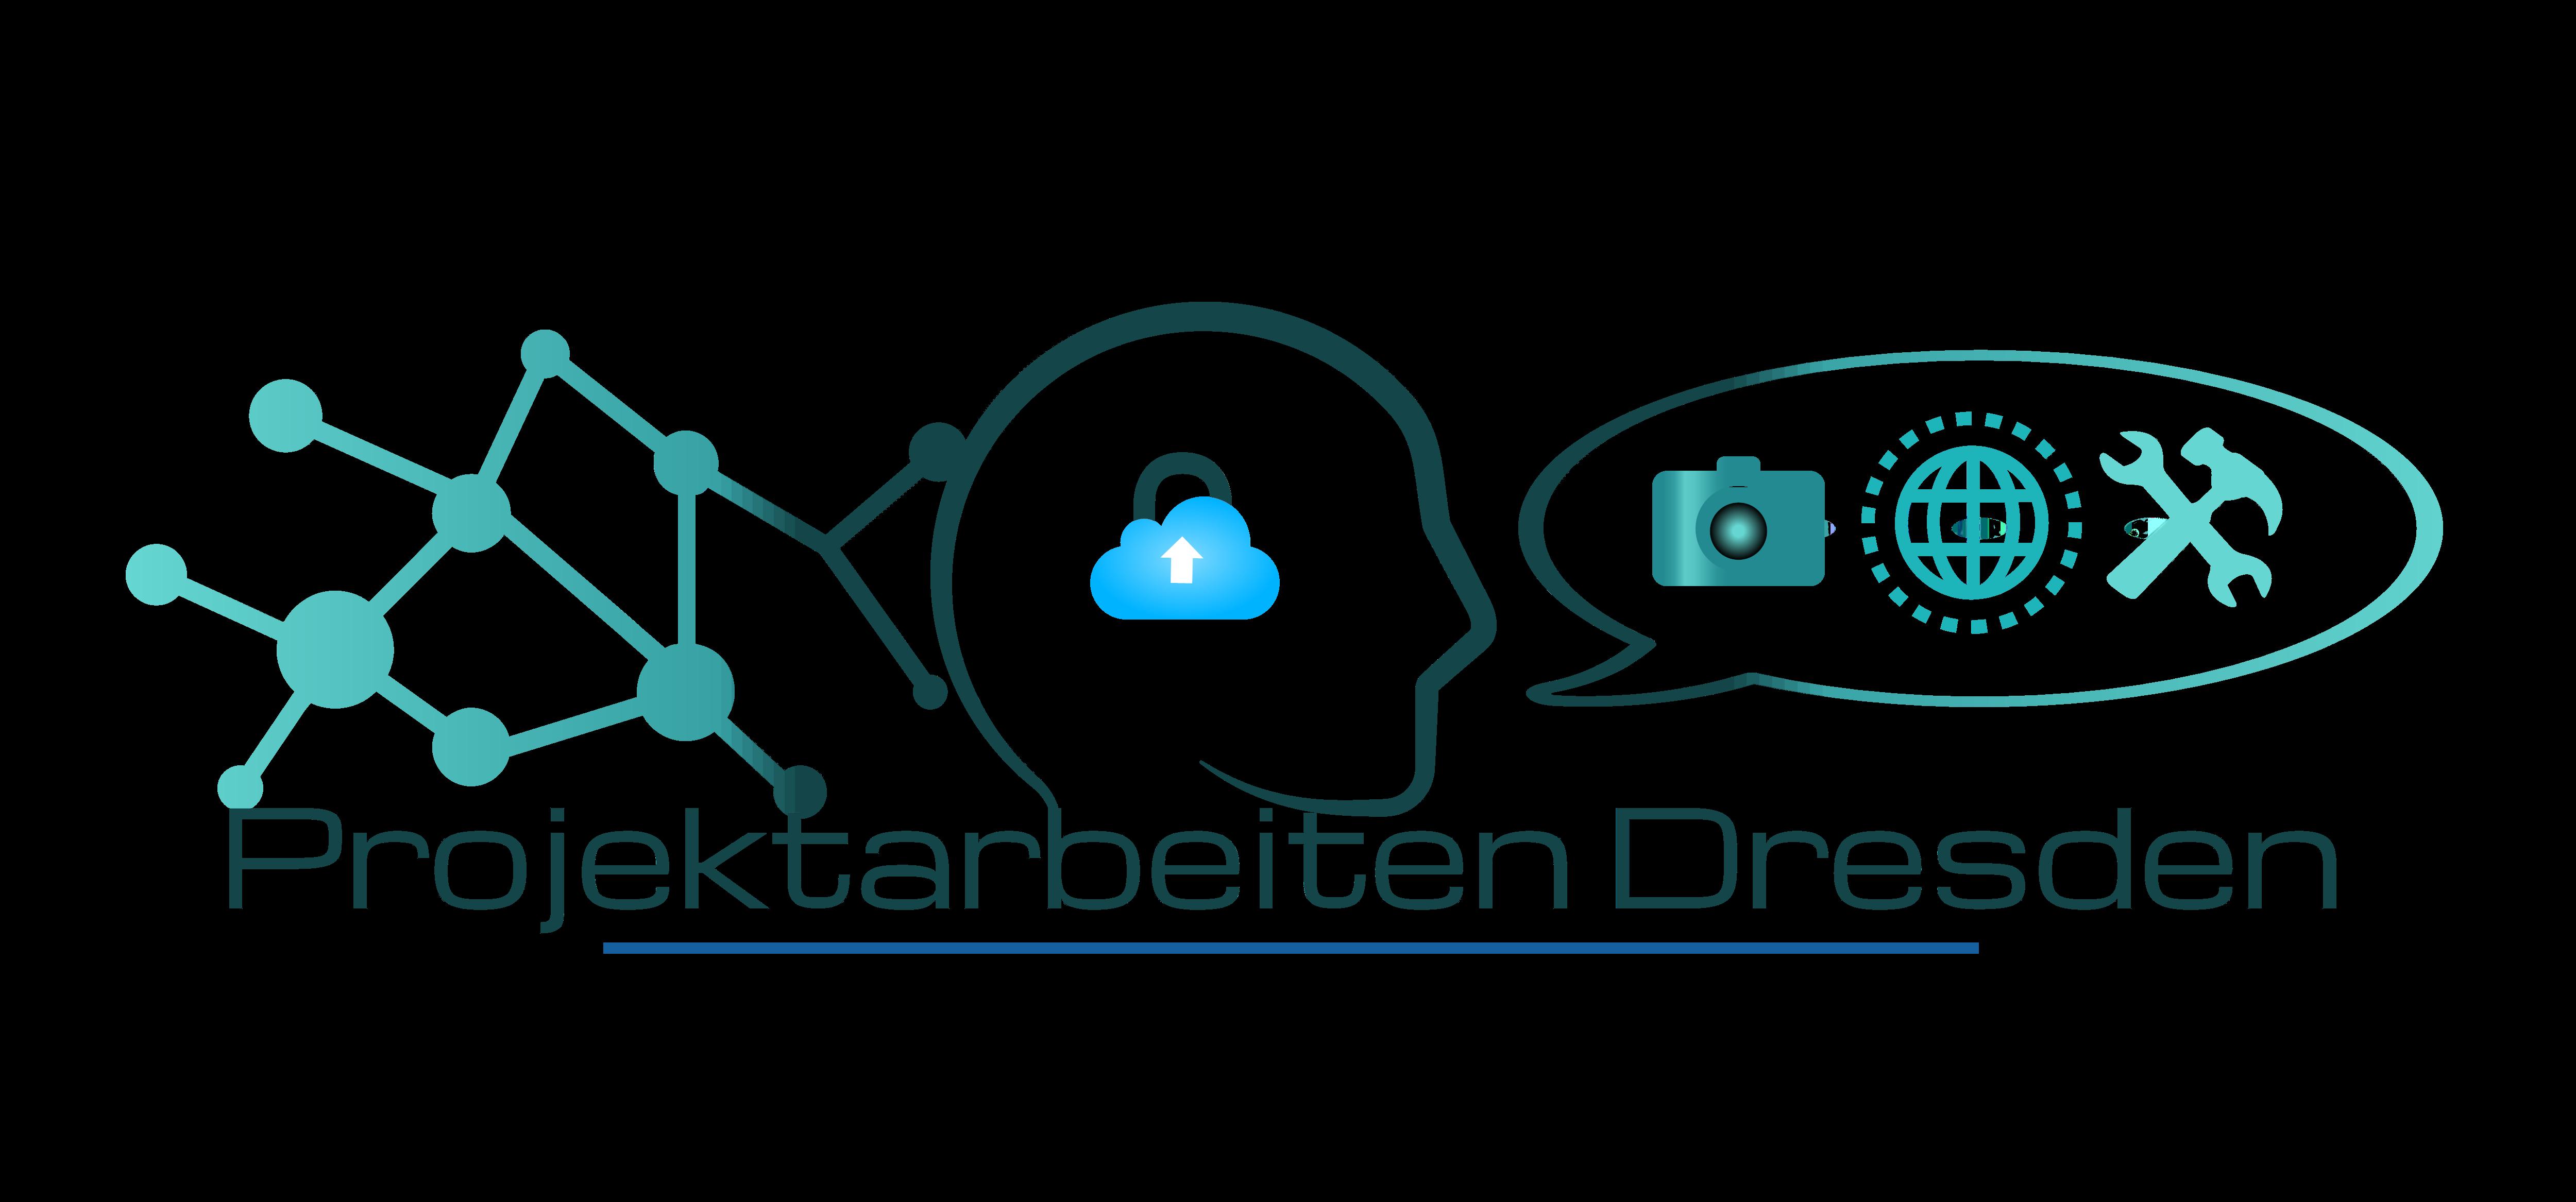 ProjektArbeiten-DresDen